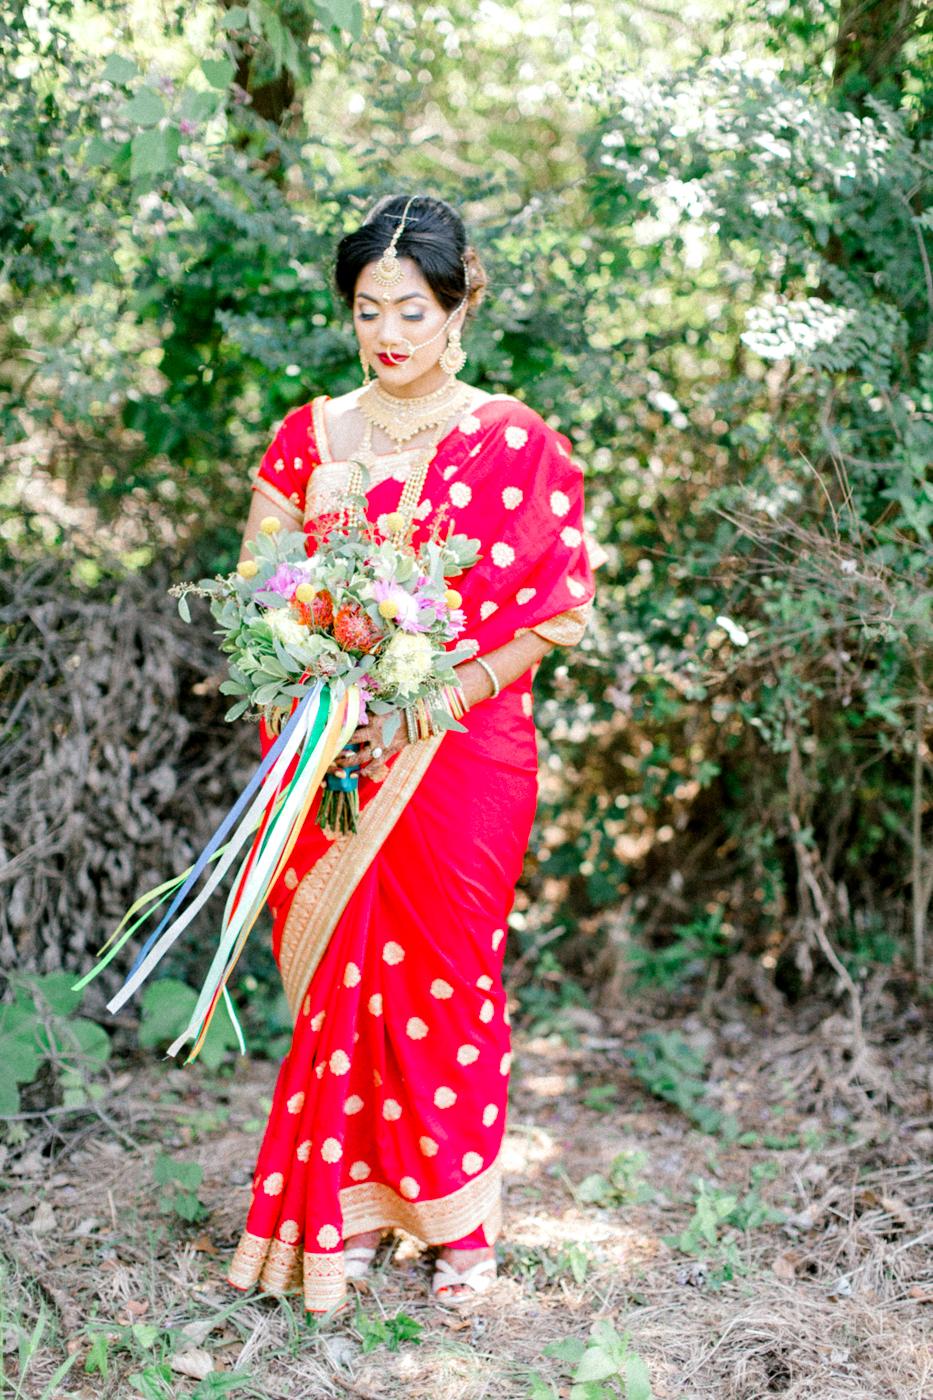 four corners photography atlanta wedding photographer indian wedding 550 trackside wedding atlanta indian wedding photographer (33 of 54).jpg